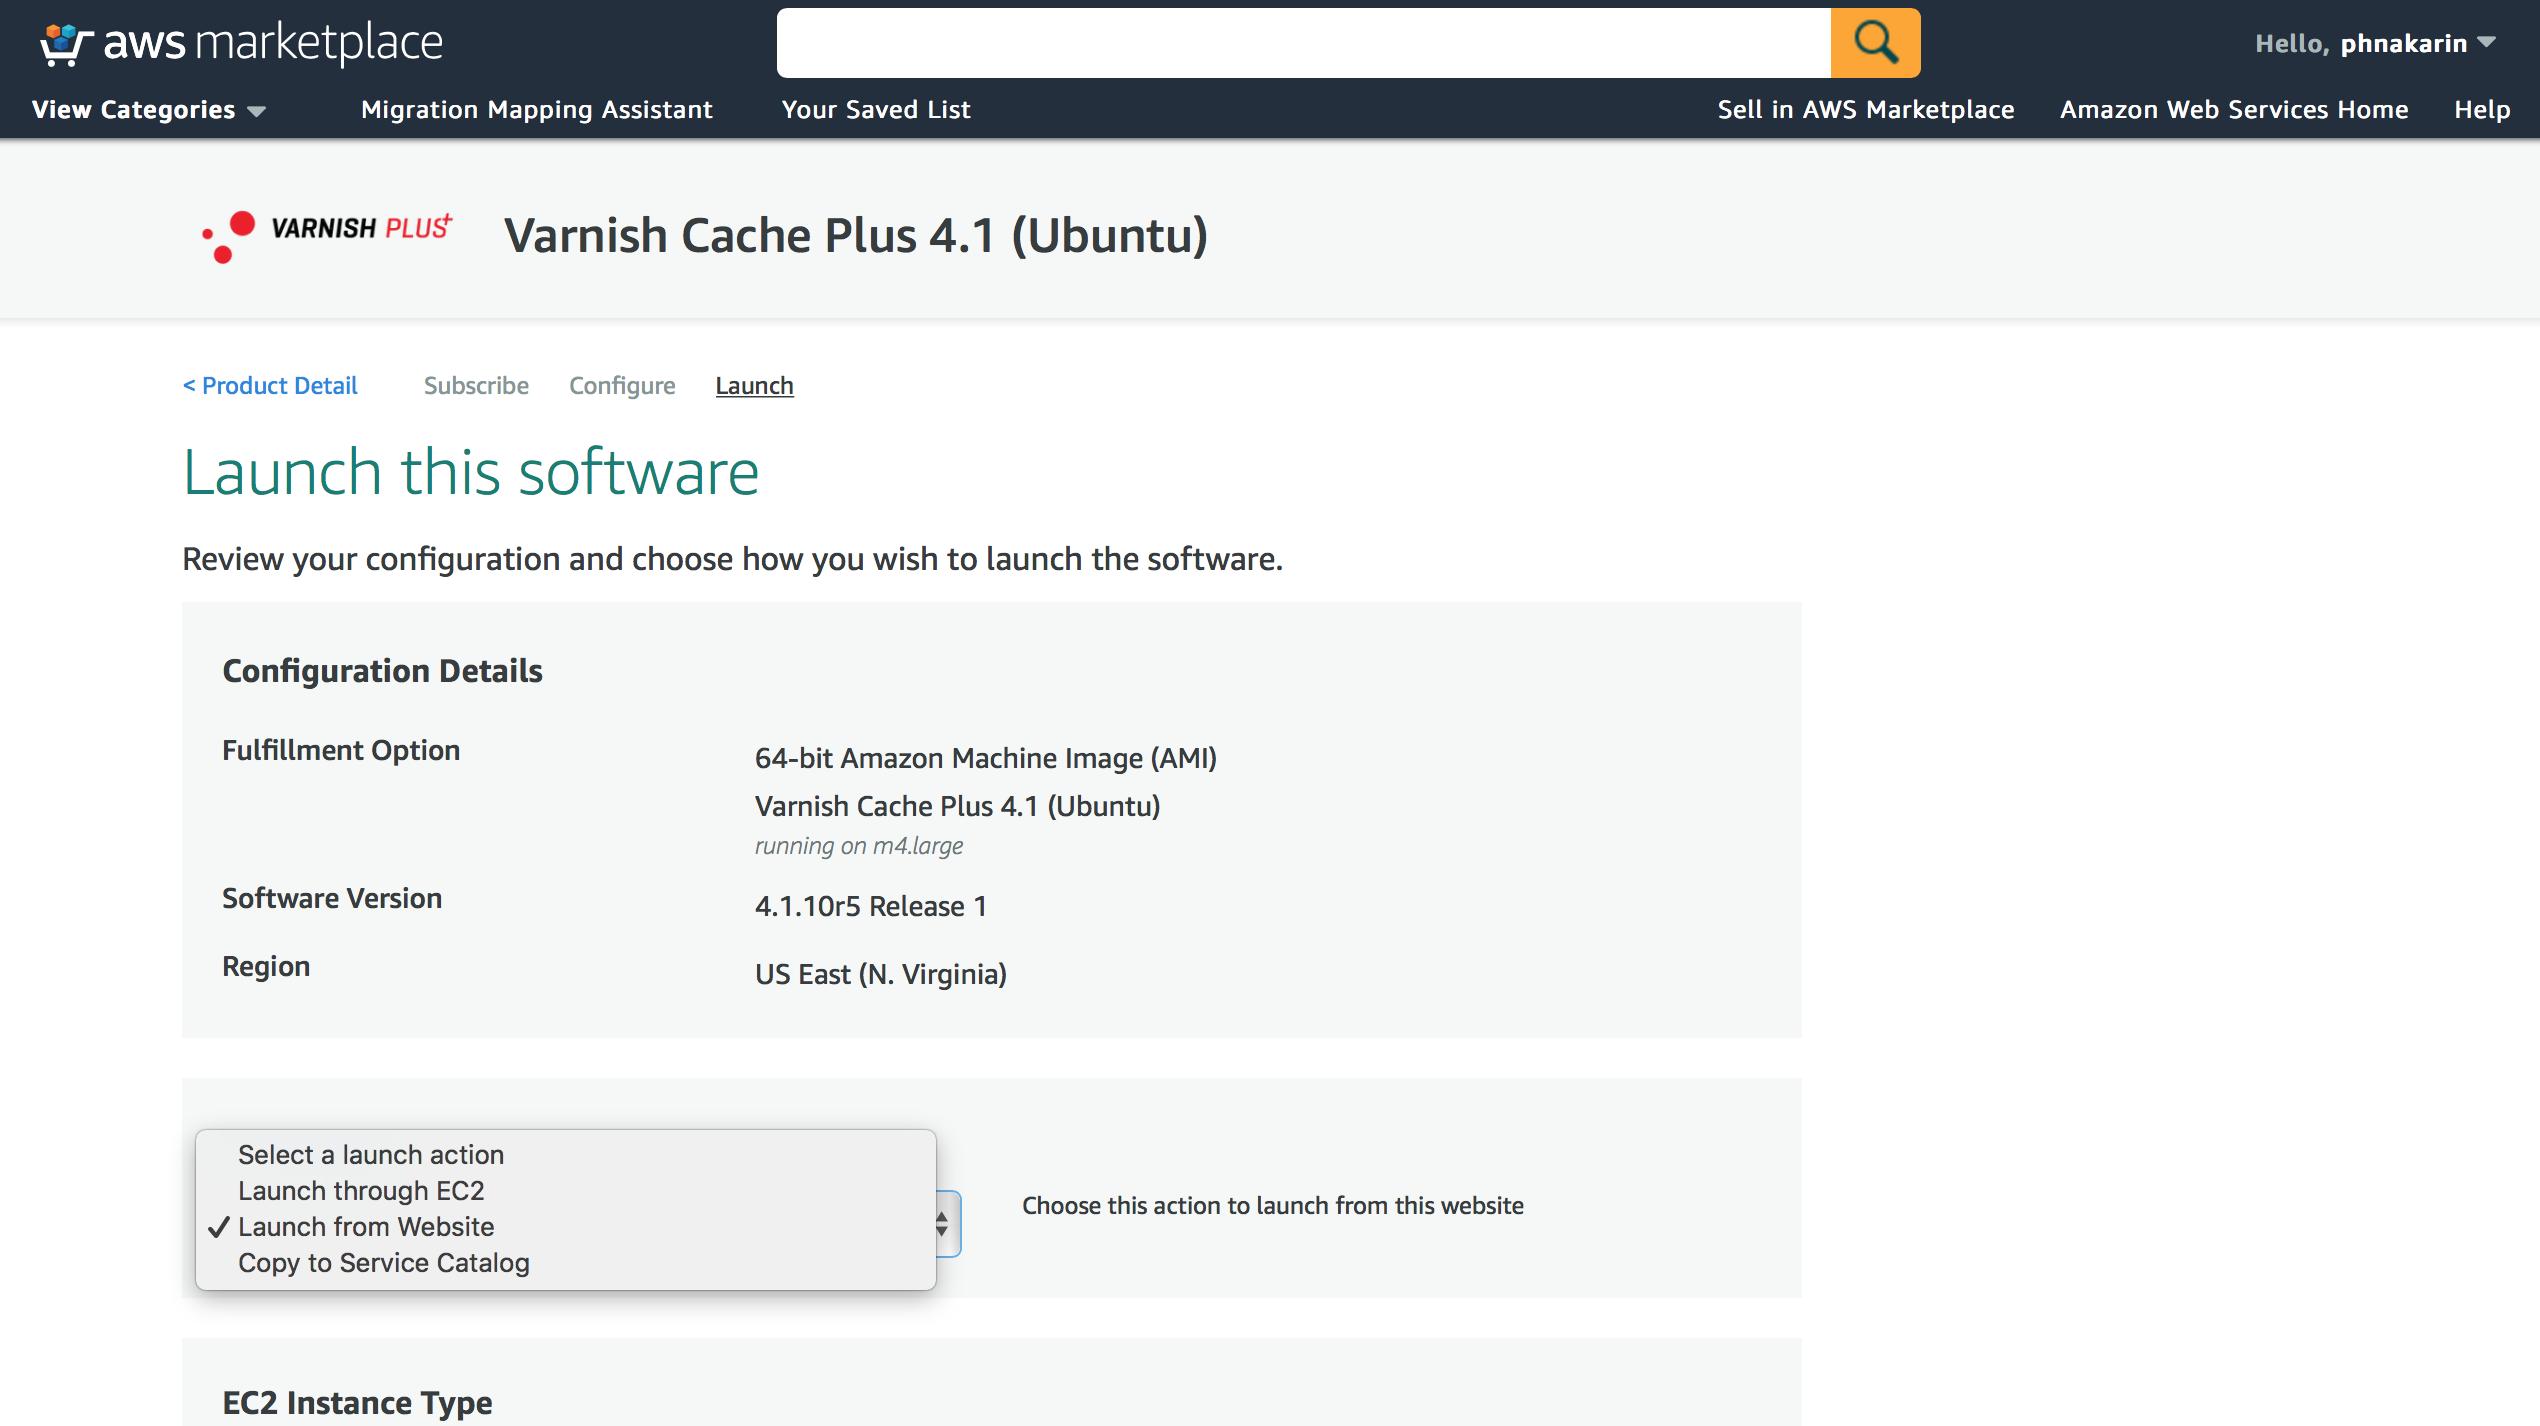 Amazon Web Services Marketplace - Varnish Cloud - Varnish